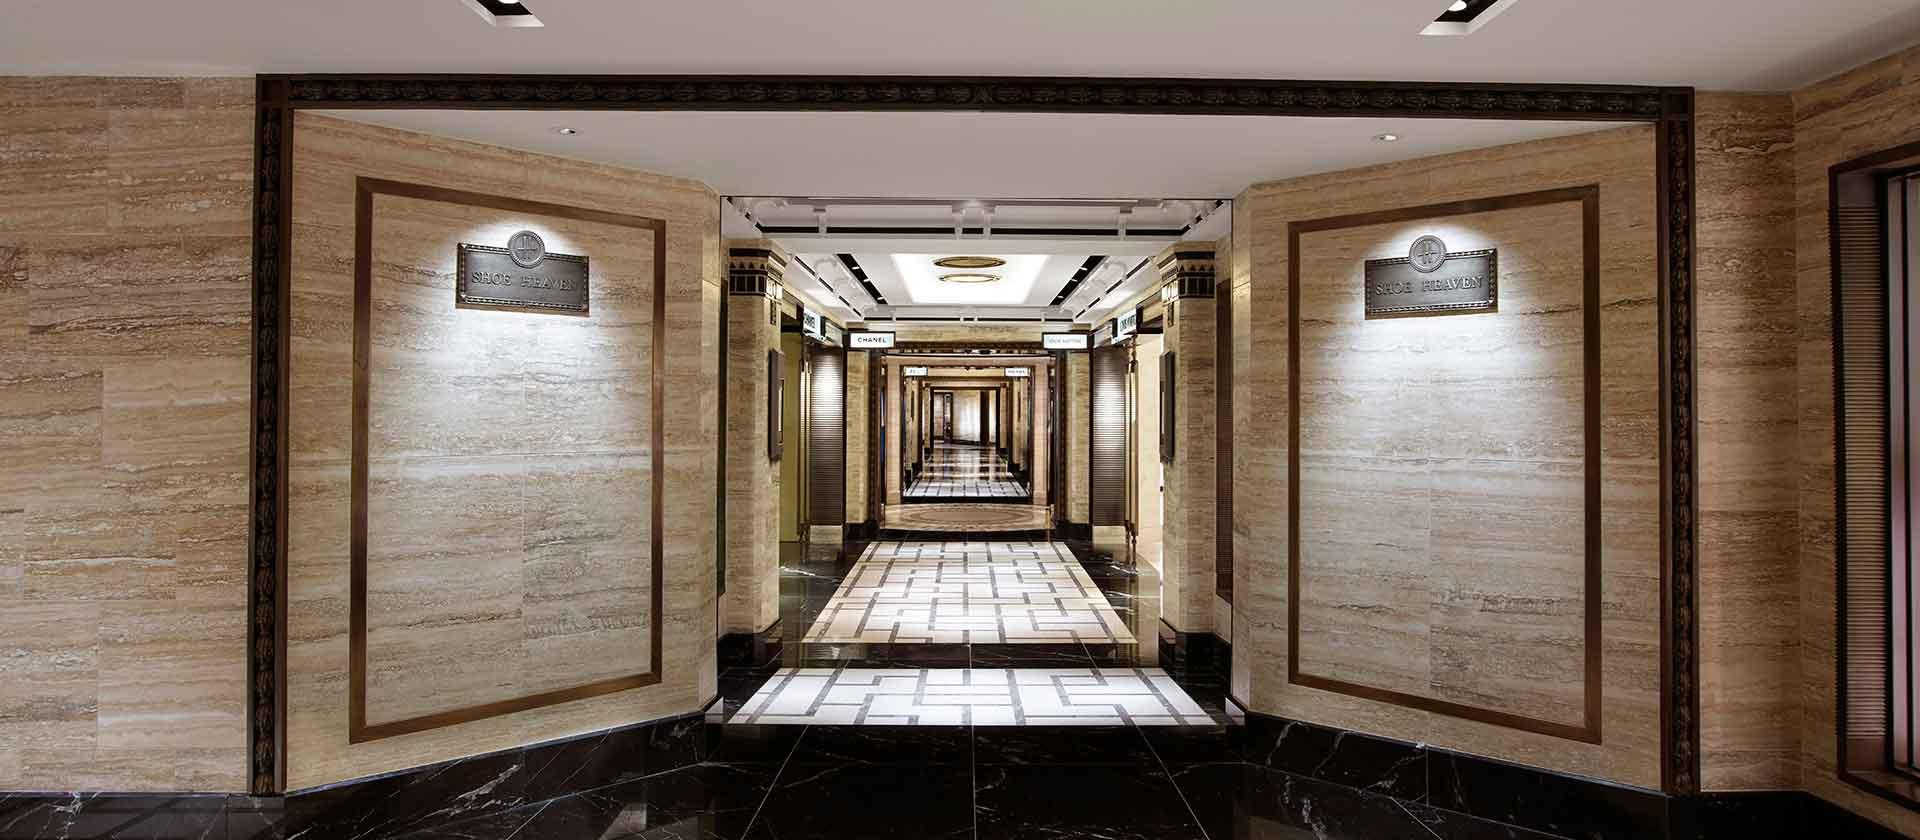 Trainor-Stone-and-Tile-Contractors-Belfast-London-Northern-Ireland-Capital-Shoe-Heaven-Featured